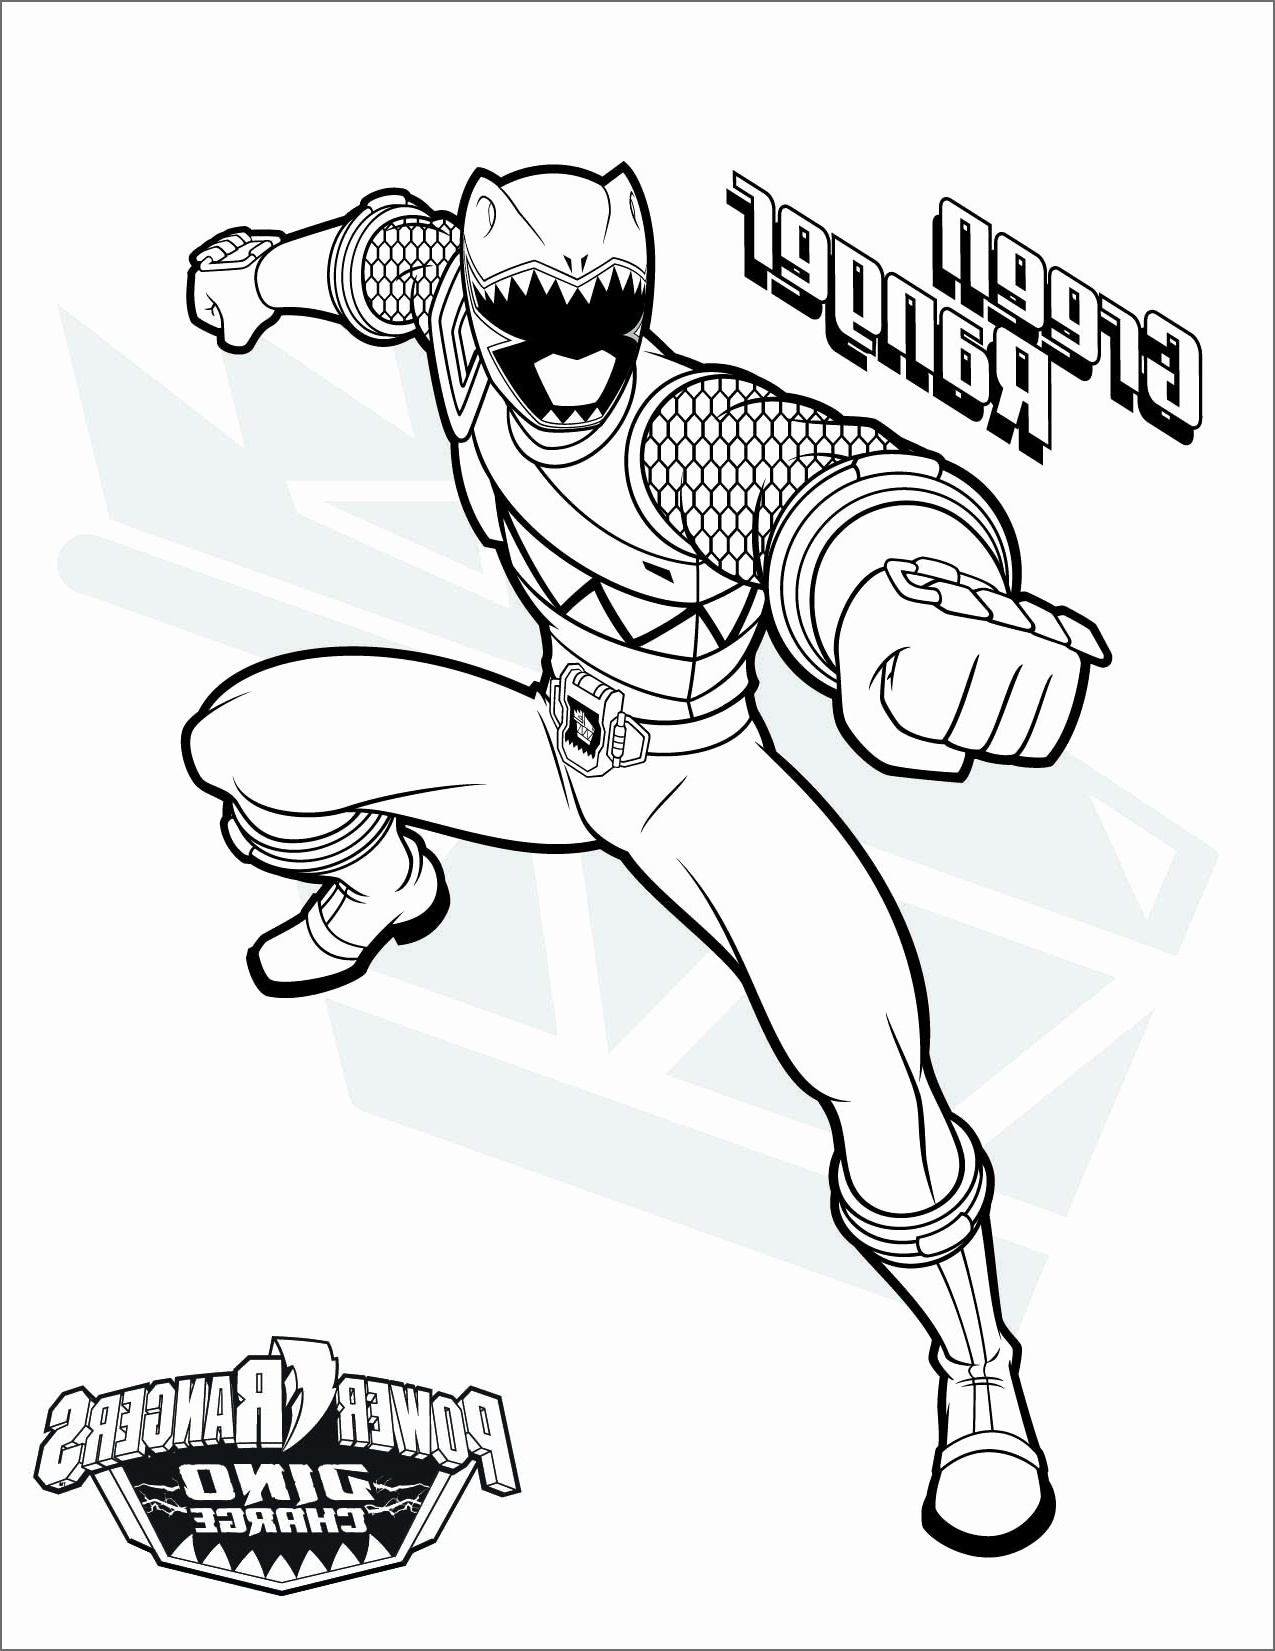 14 Beau De Coloriage Power Rangers Dino Charge Photos encequiconcerne Coloriage Power Rangers A Imprimer